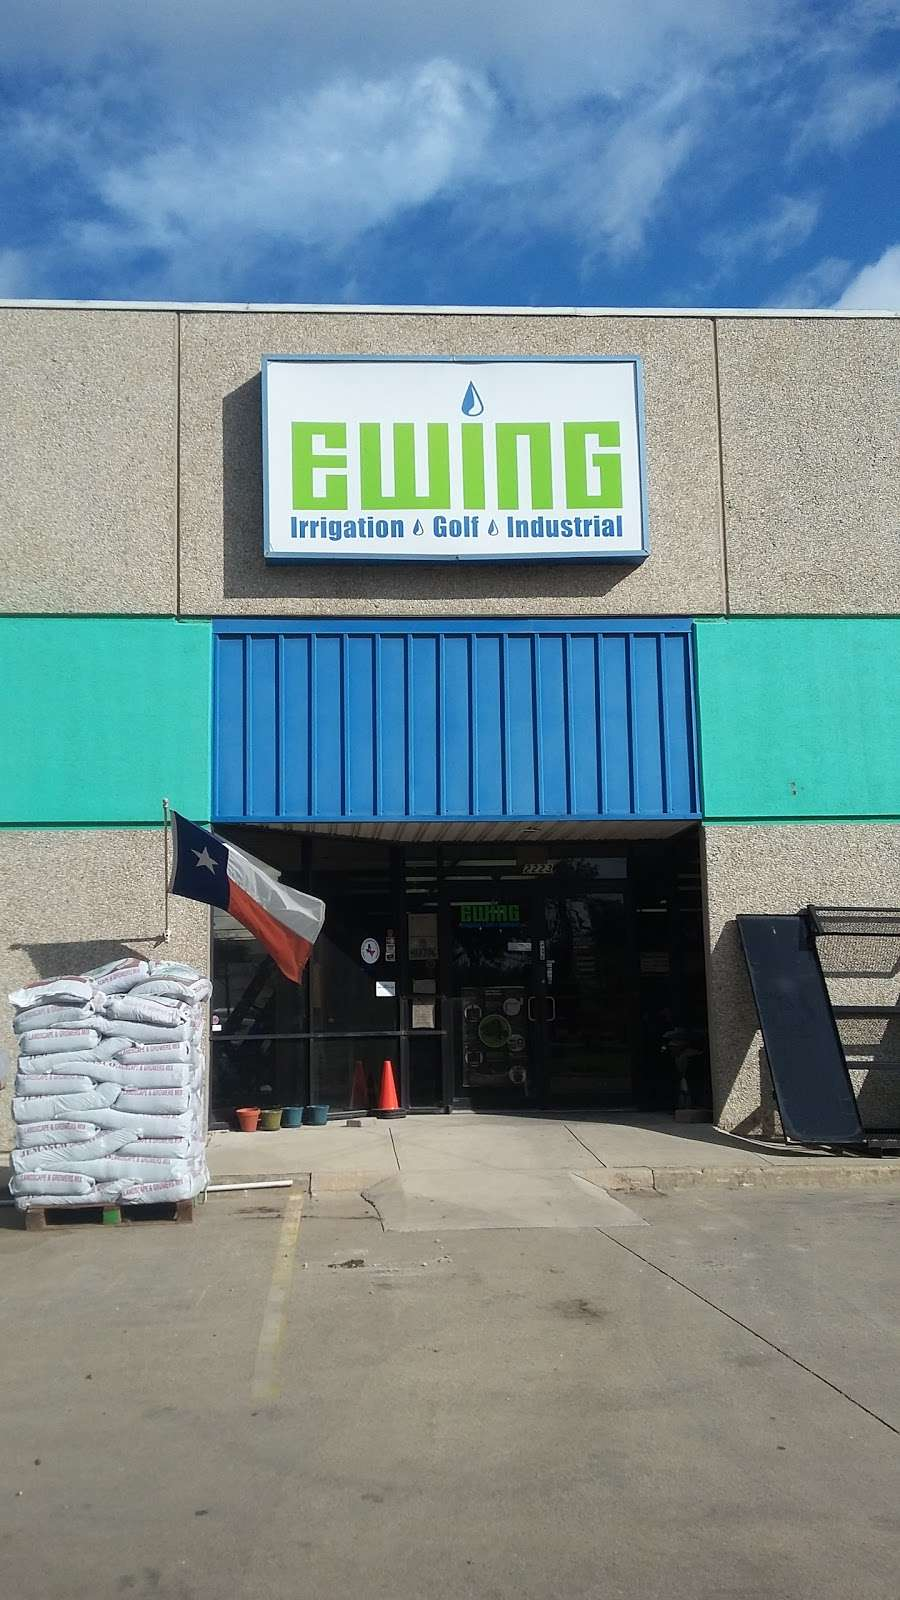 Ewing Irrigation Landscape Supply 10525 Wireway Dr Dallas Tx 75220 Usa